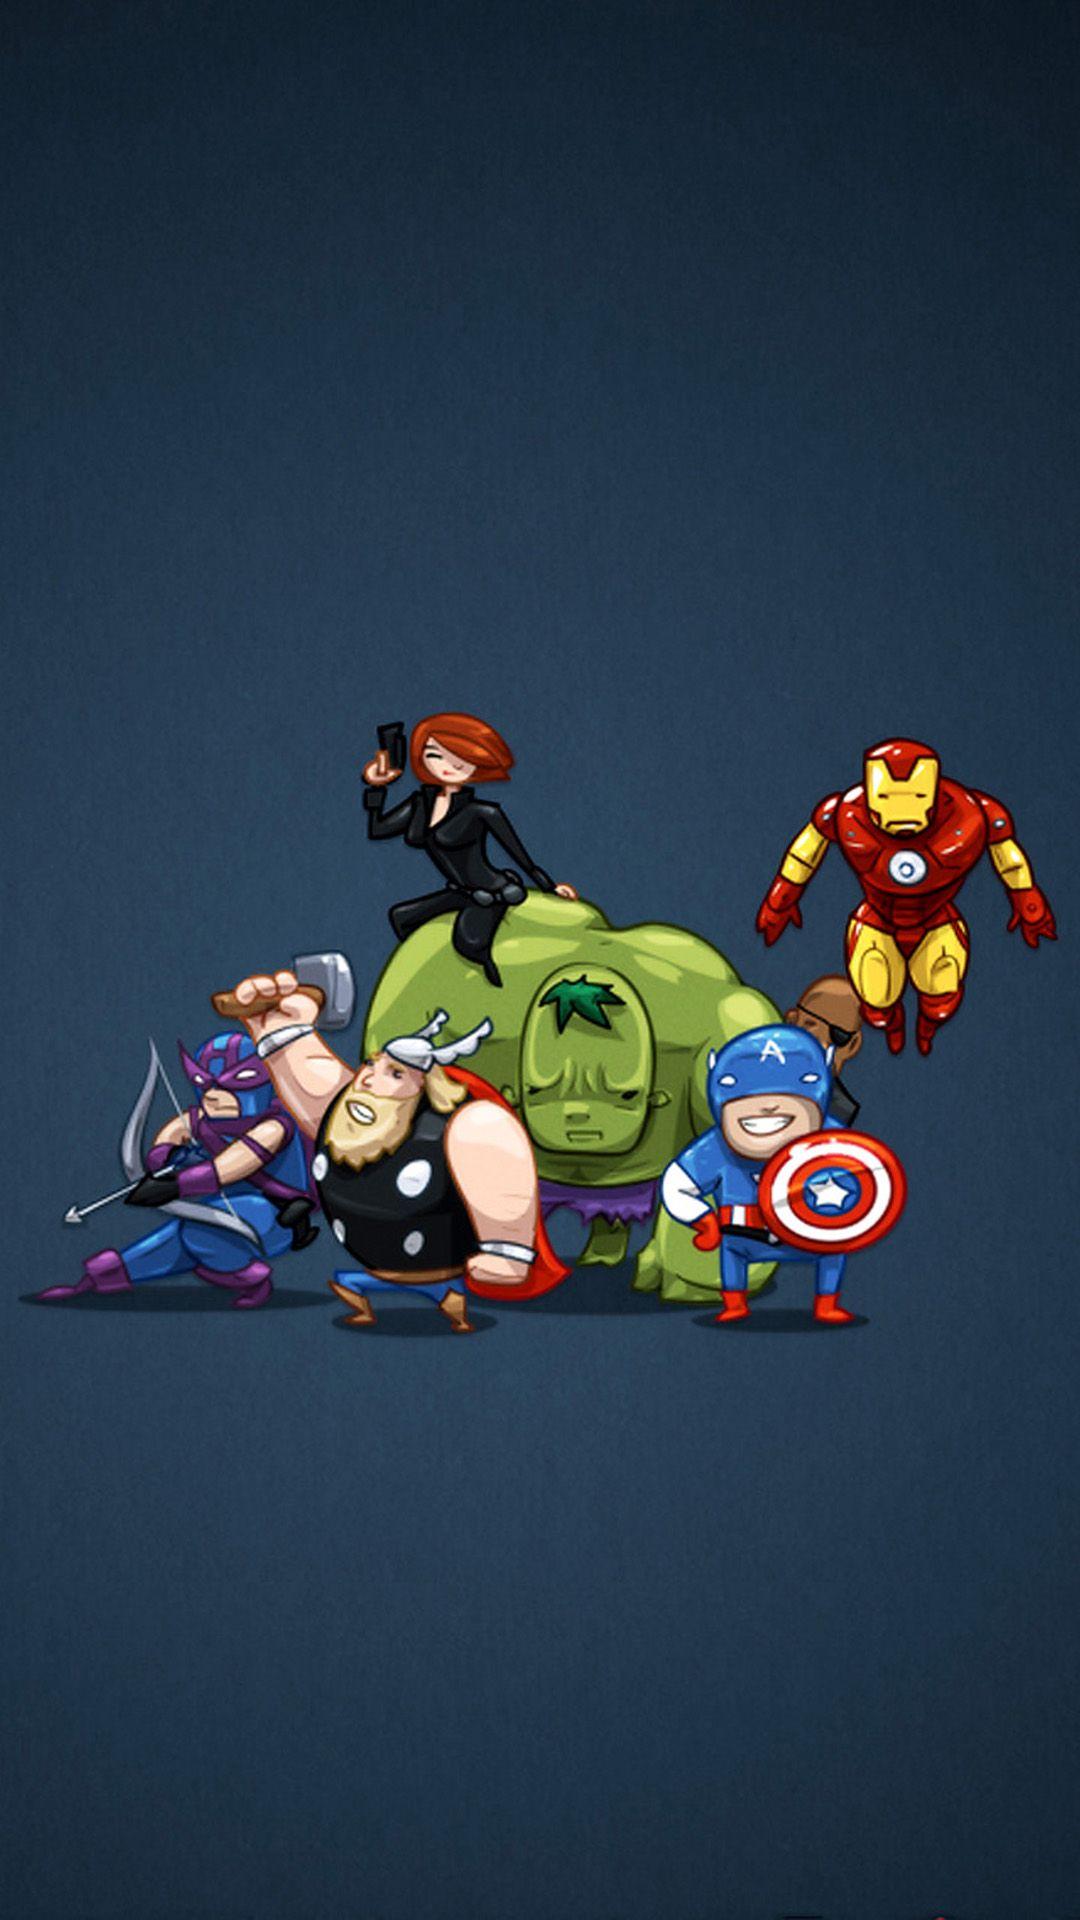 Wallpaper iphone avengers - The Avengers Iphone 5 Wallpaper